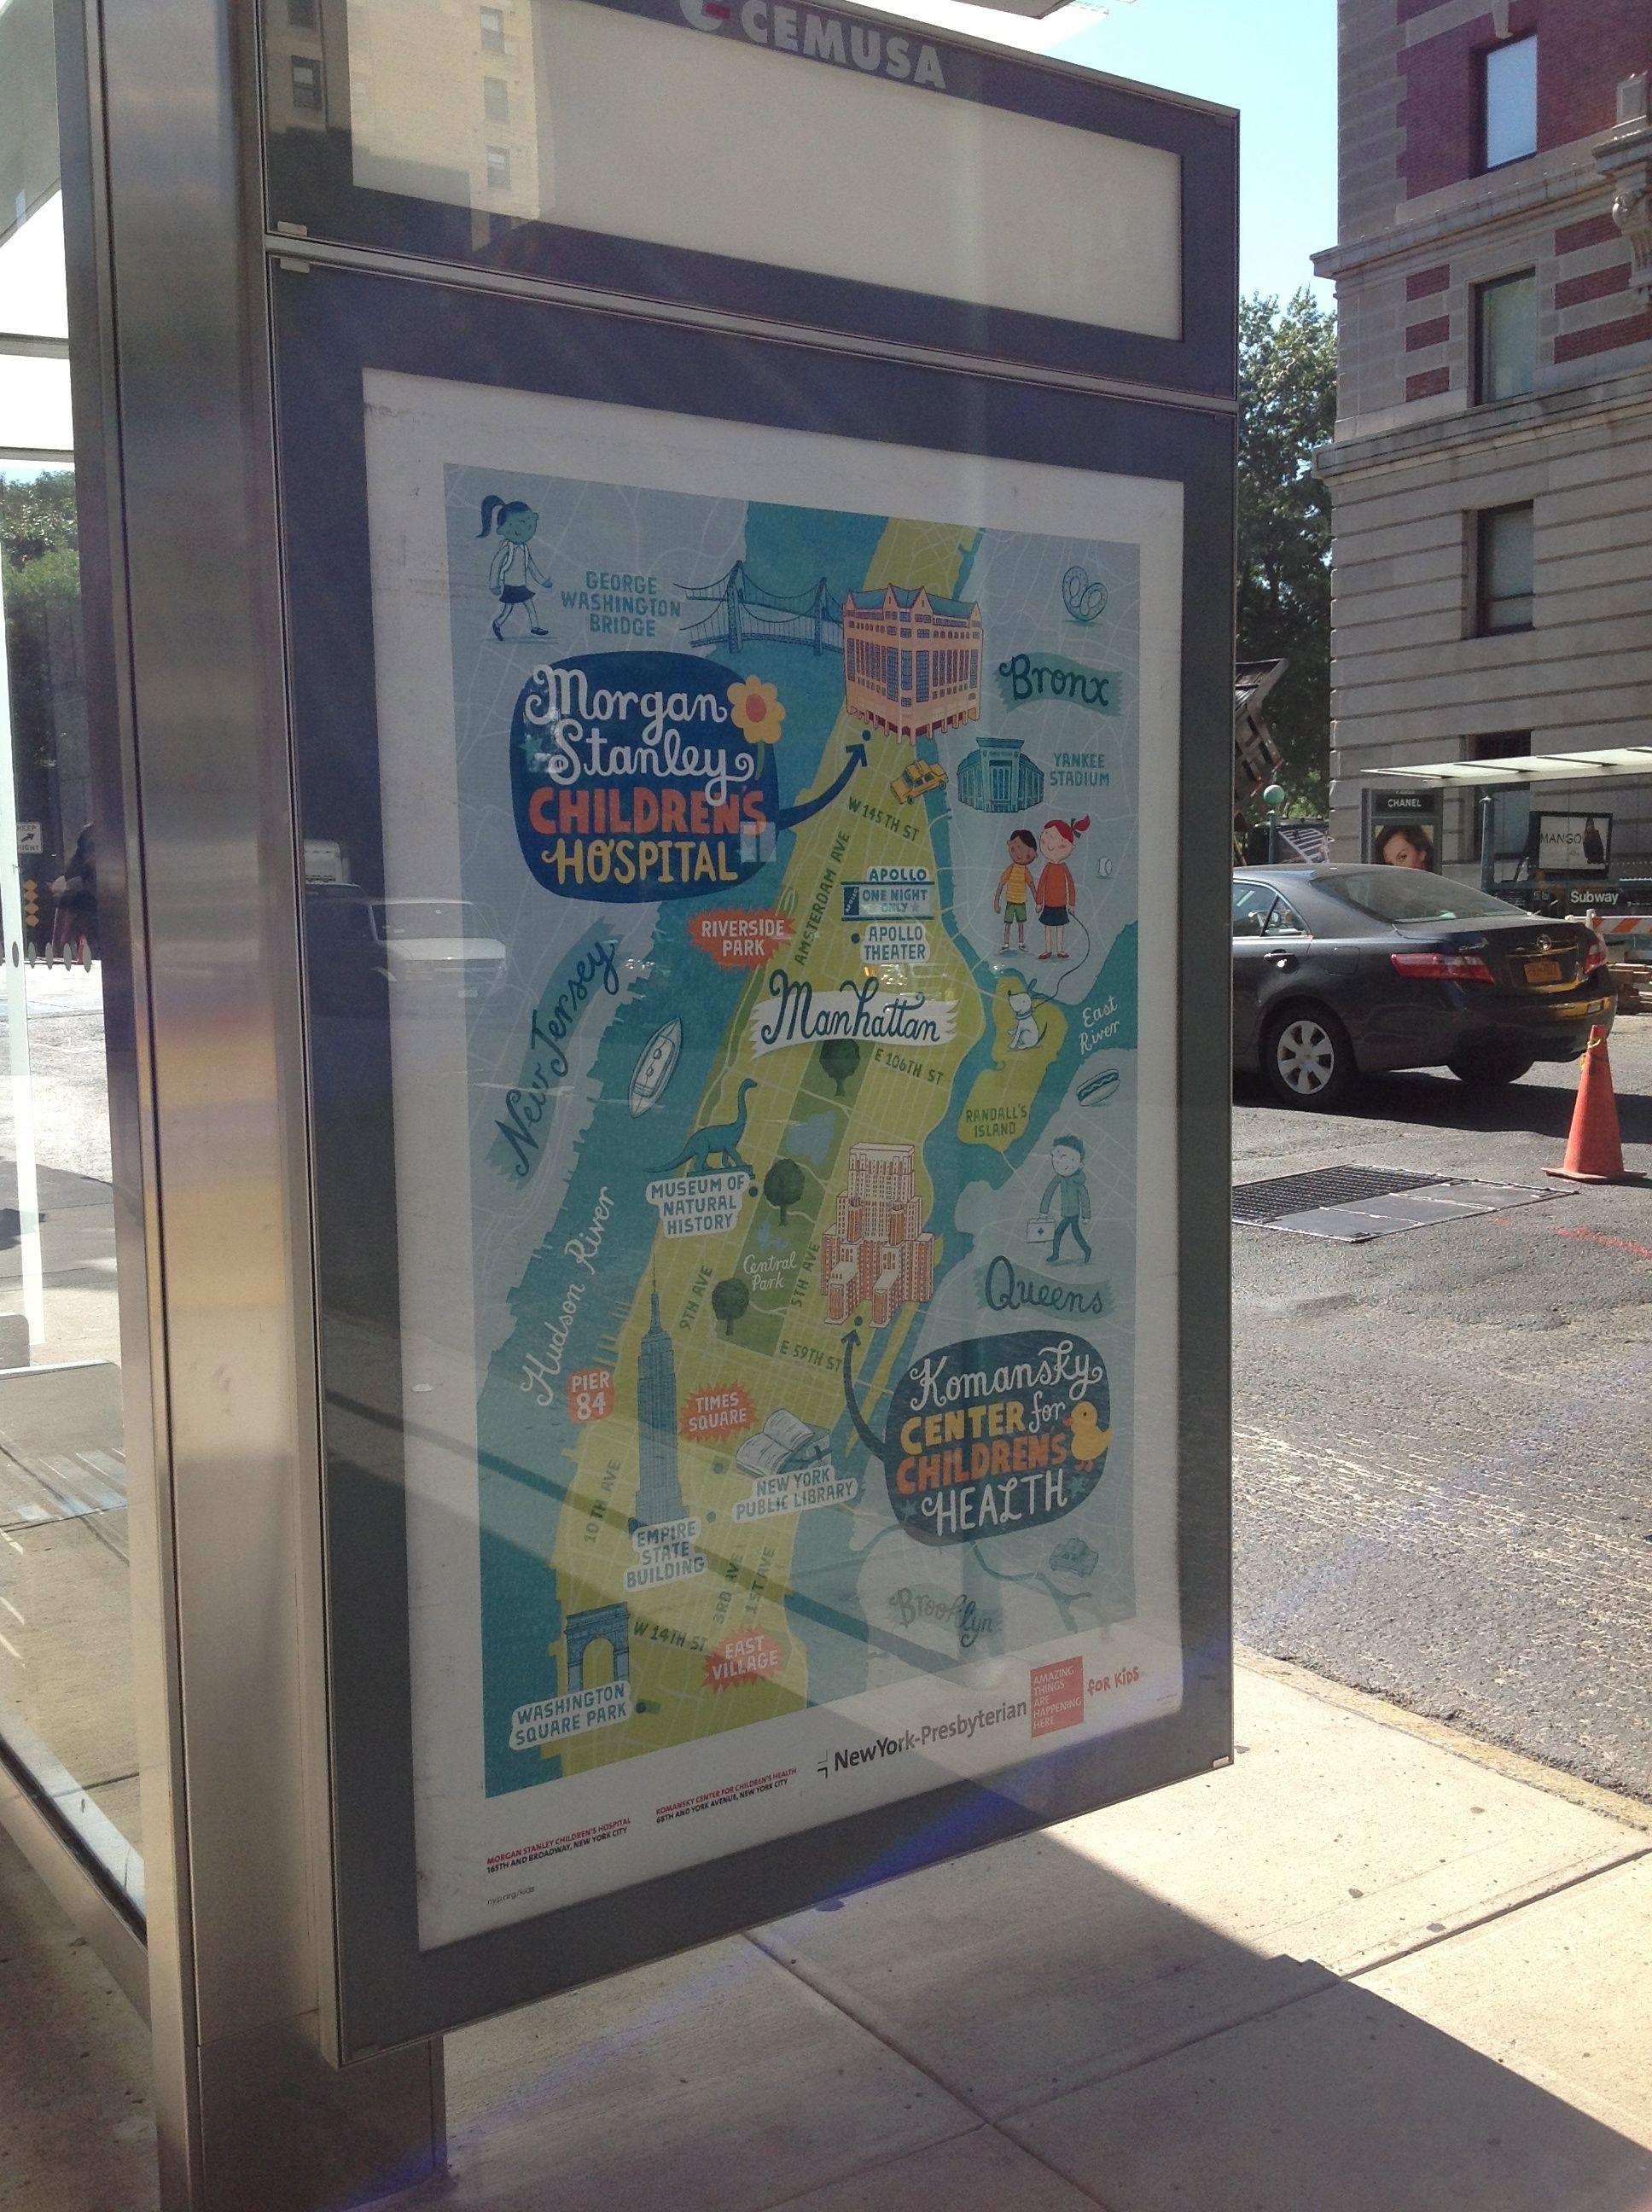 Map for New York Presbyterian Hospital by Linzie Hunter ... New York Presbyterian Hospital Map on